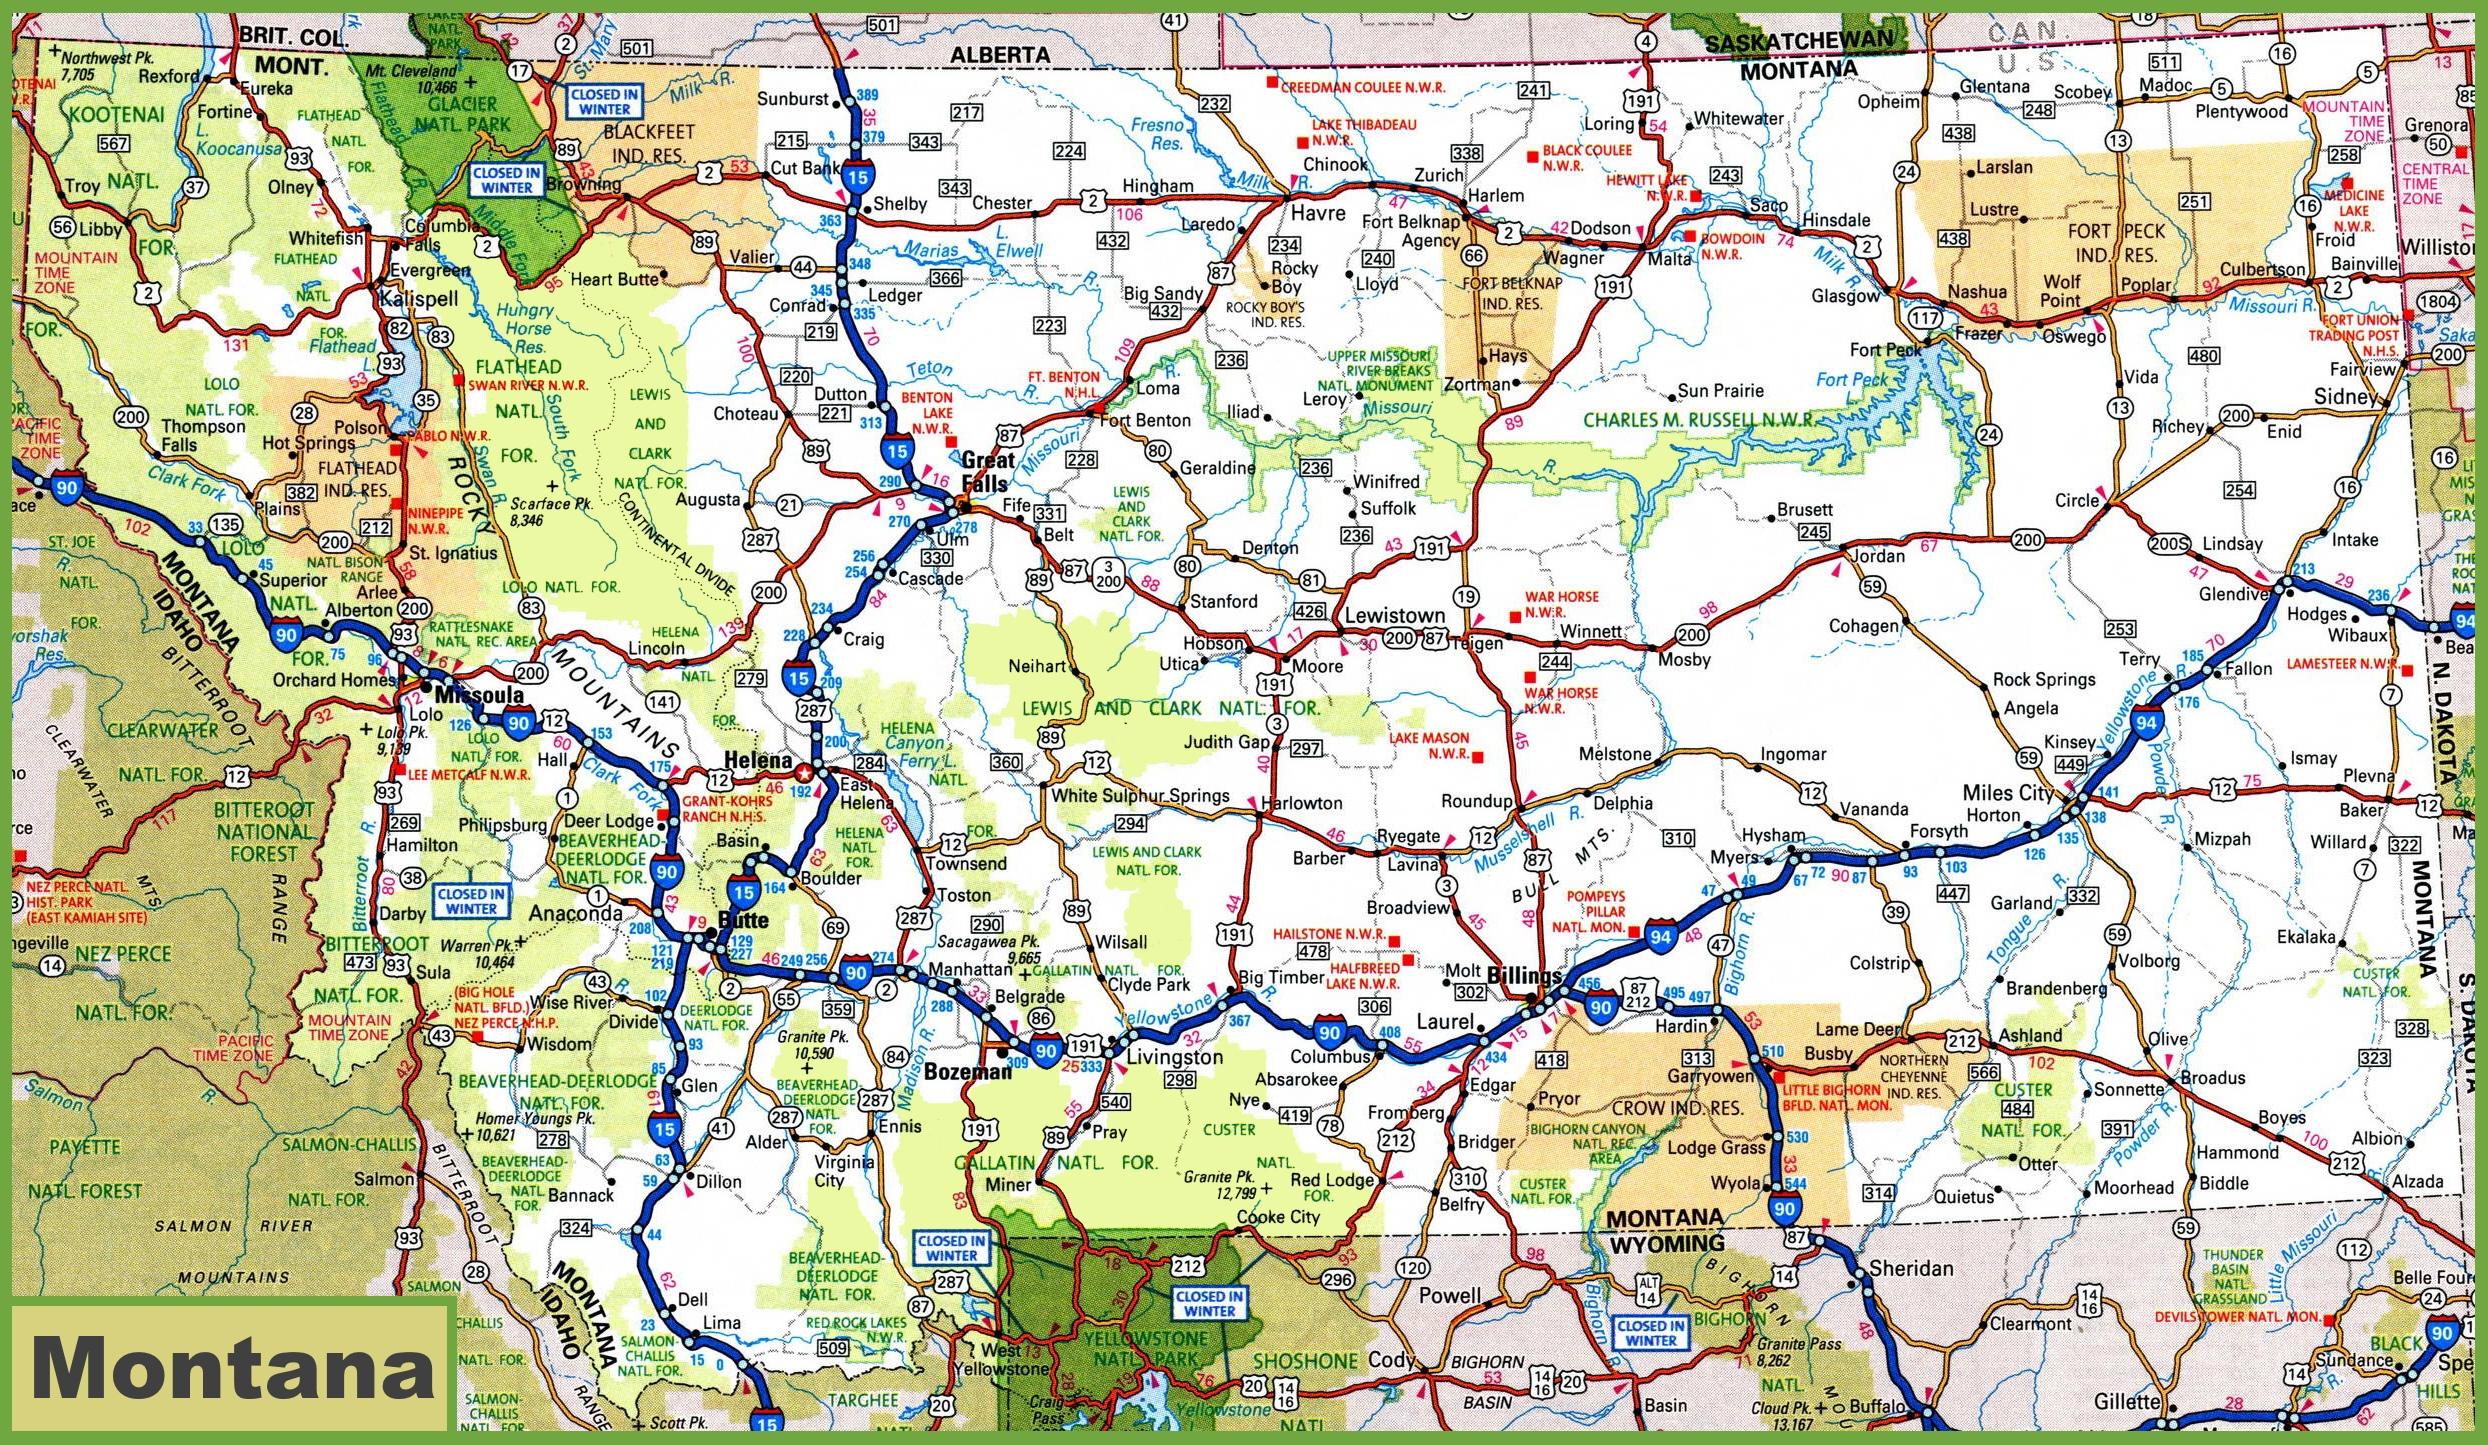 Montana Road Map - Printable Road Maps